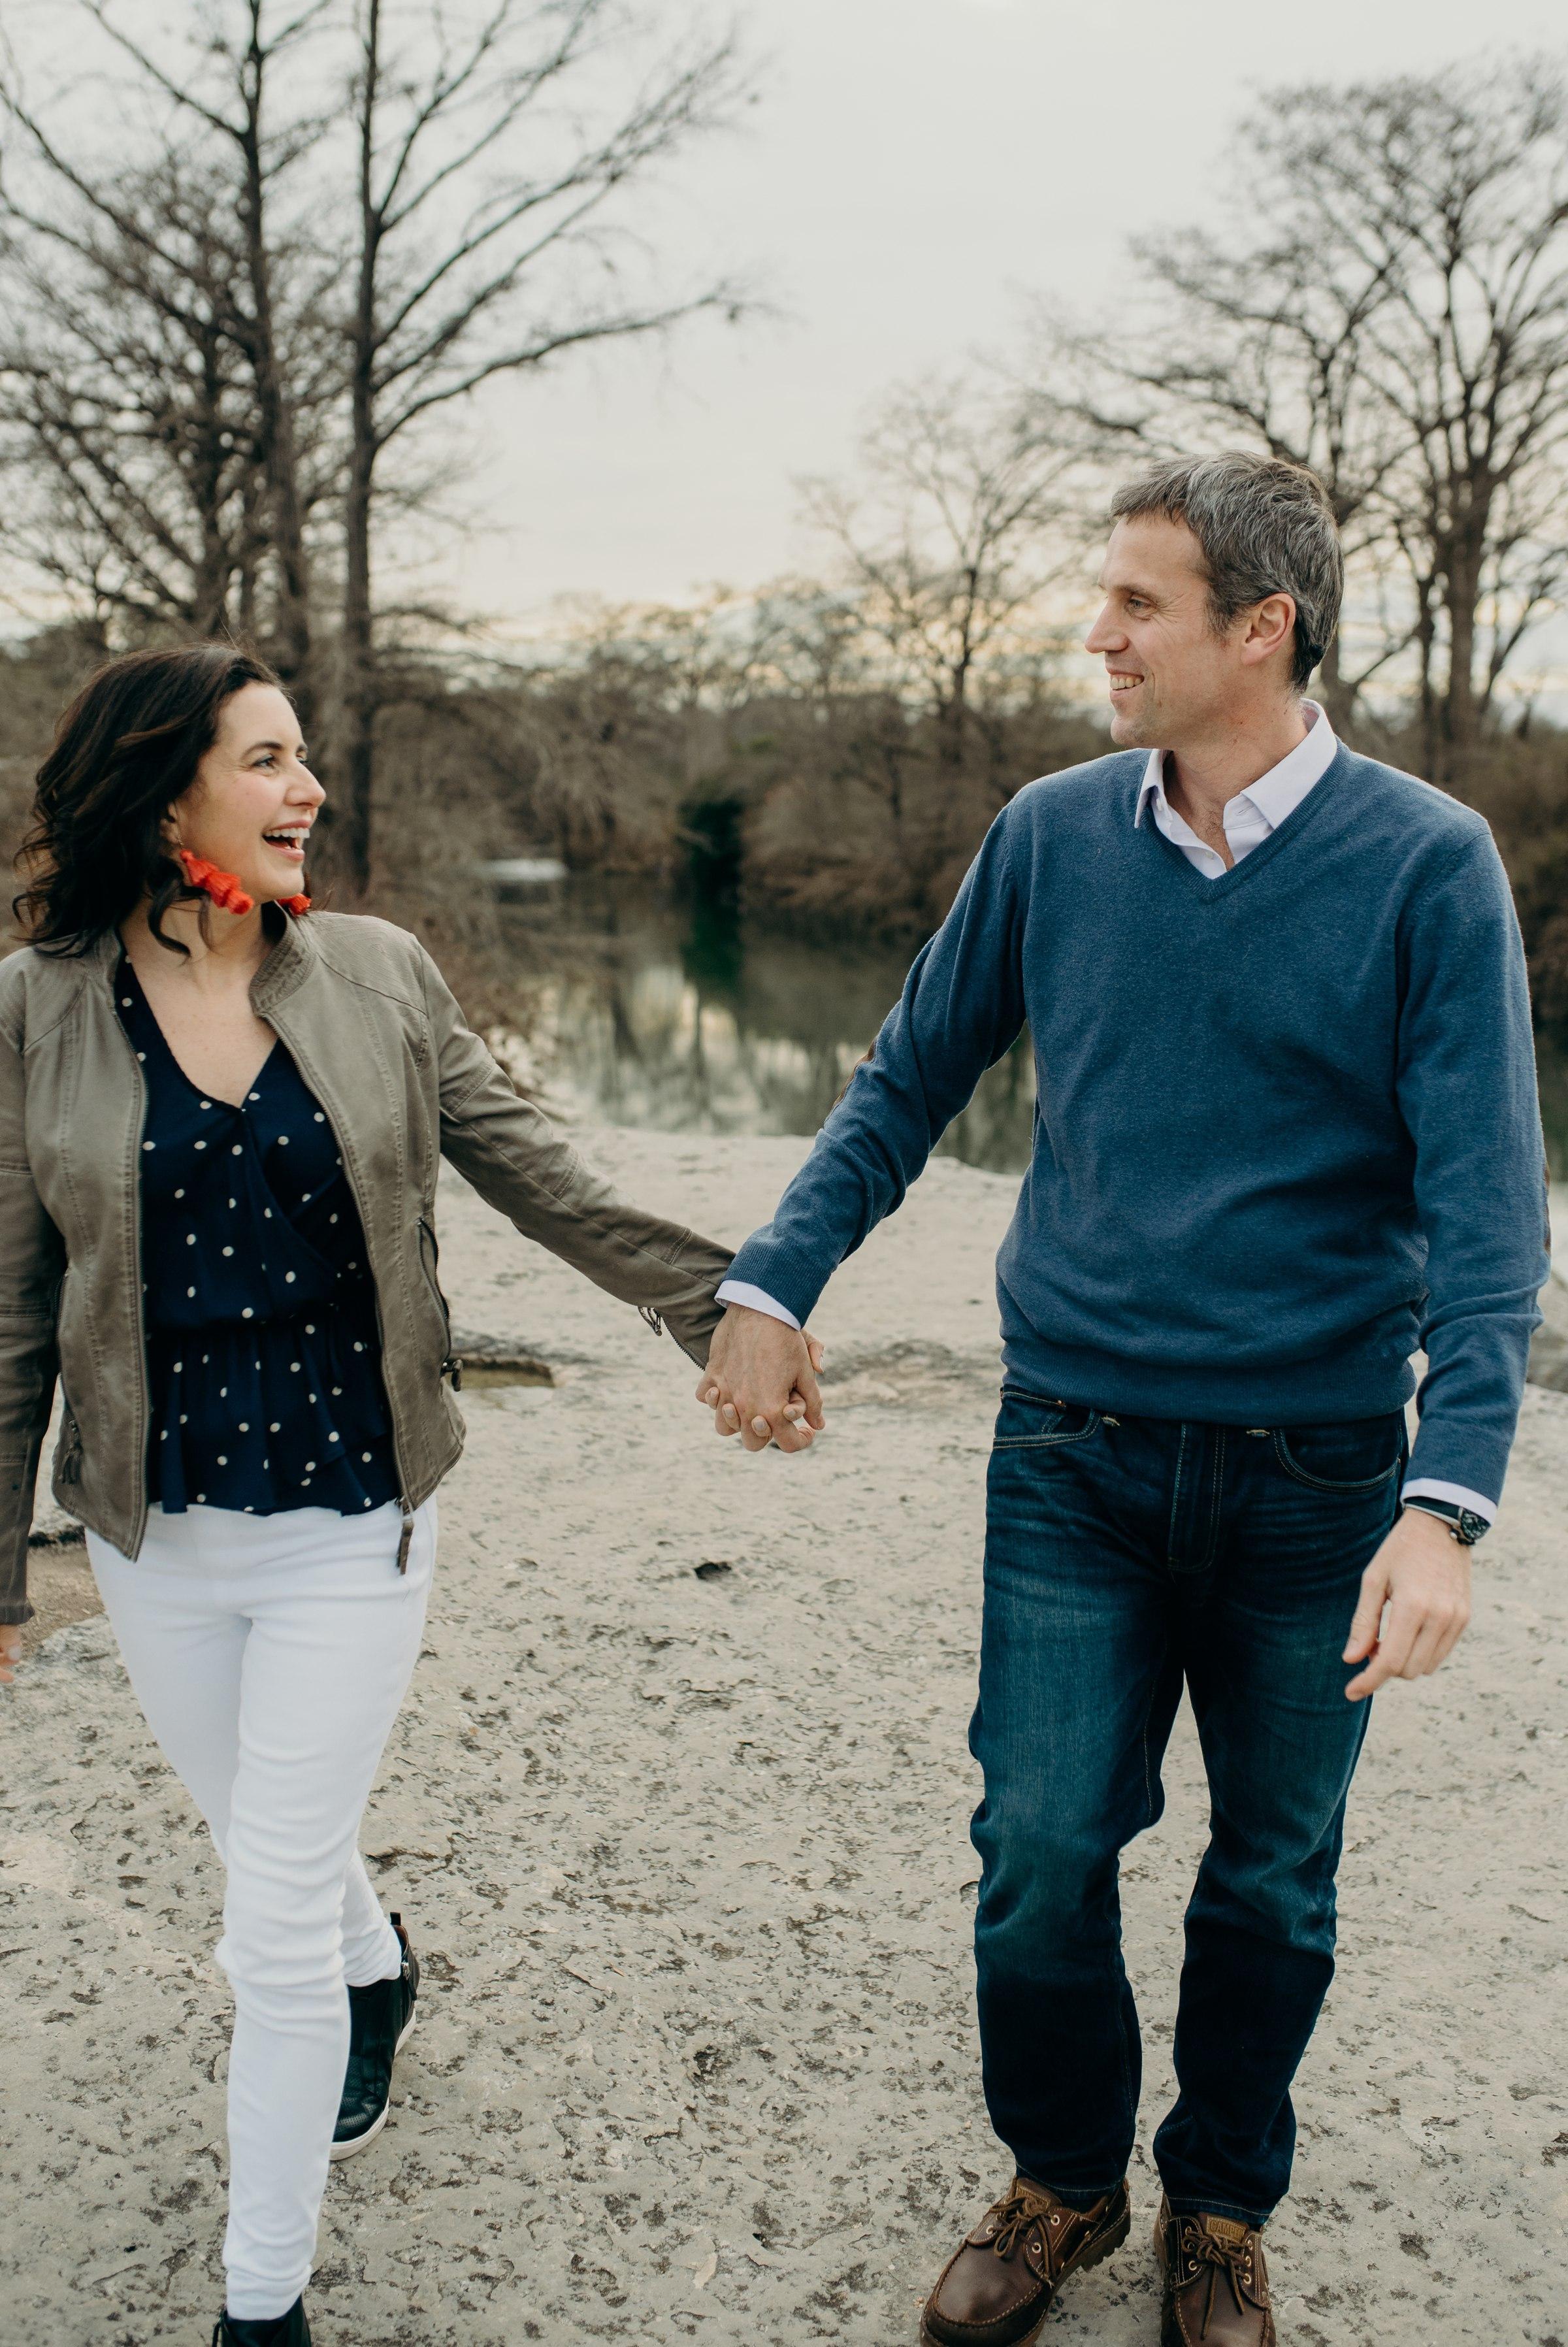 austin-mckinney-falls-engagement-photographer-elopement-prices-best-headshot-senior-adventurous-italy-minneapolis-texas-minnesota-dallas-houston-tulum-mexico_0038.jpg